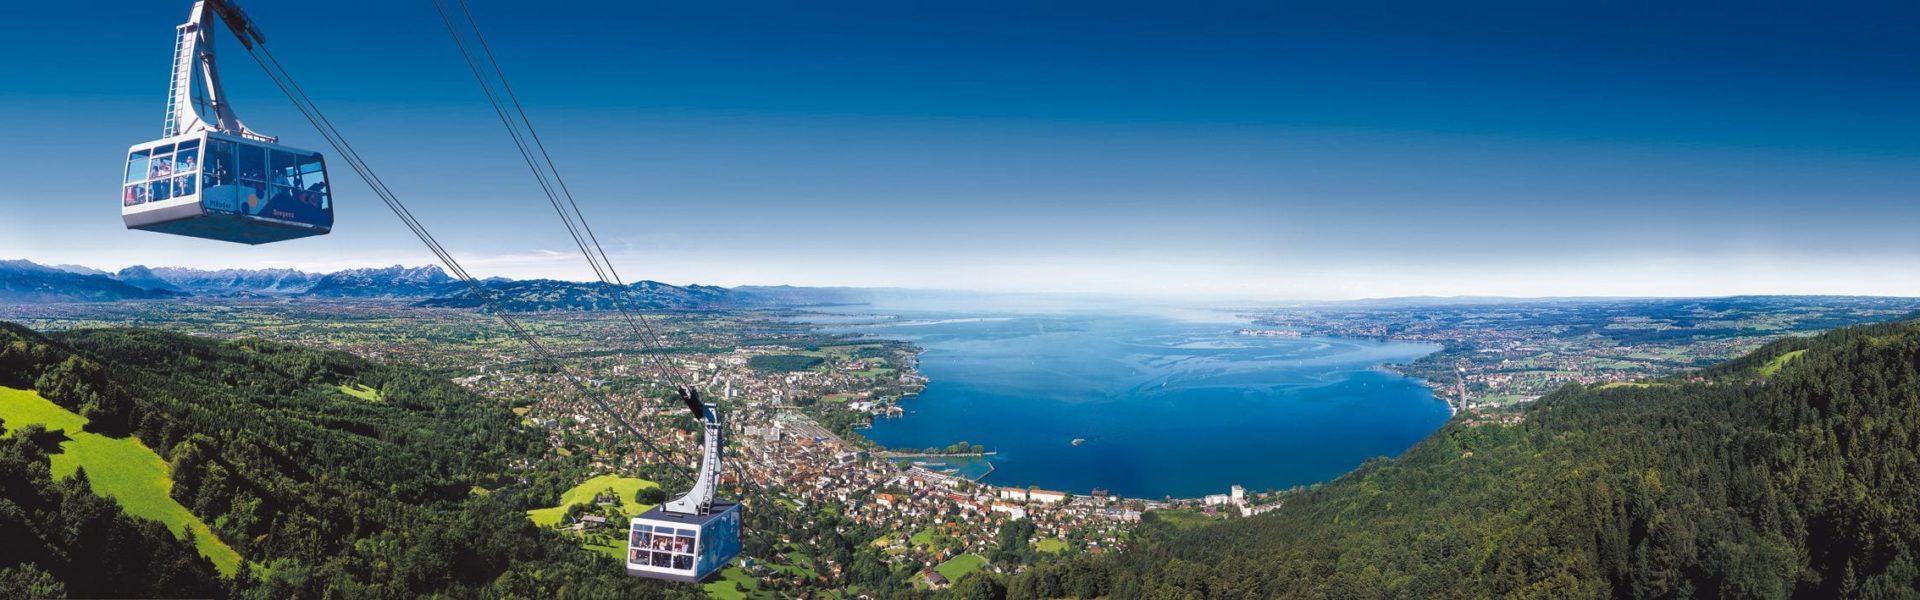 Pfänderbahn, Bergbahn, Ausflugsziel, V-CARD (c) Otmar Heidegger / Vorarlberg Tourismus